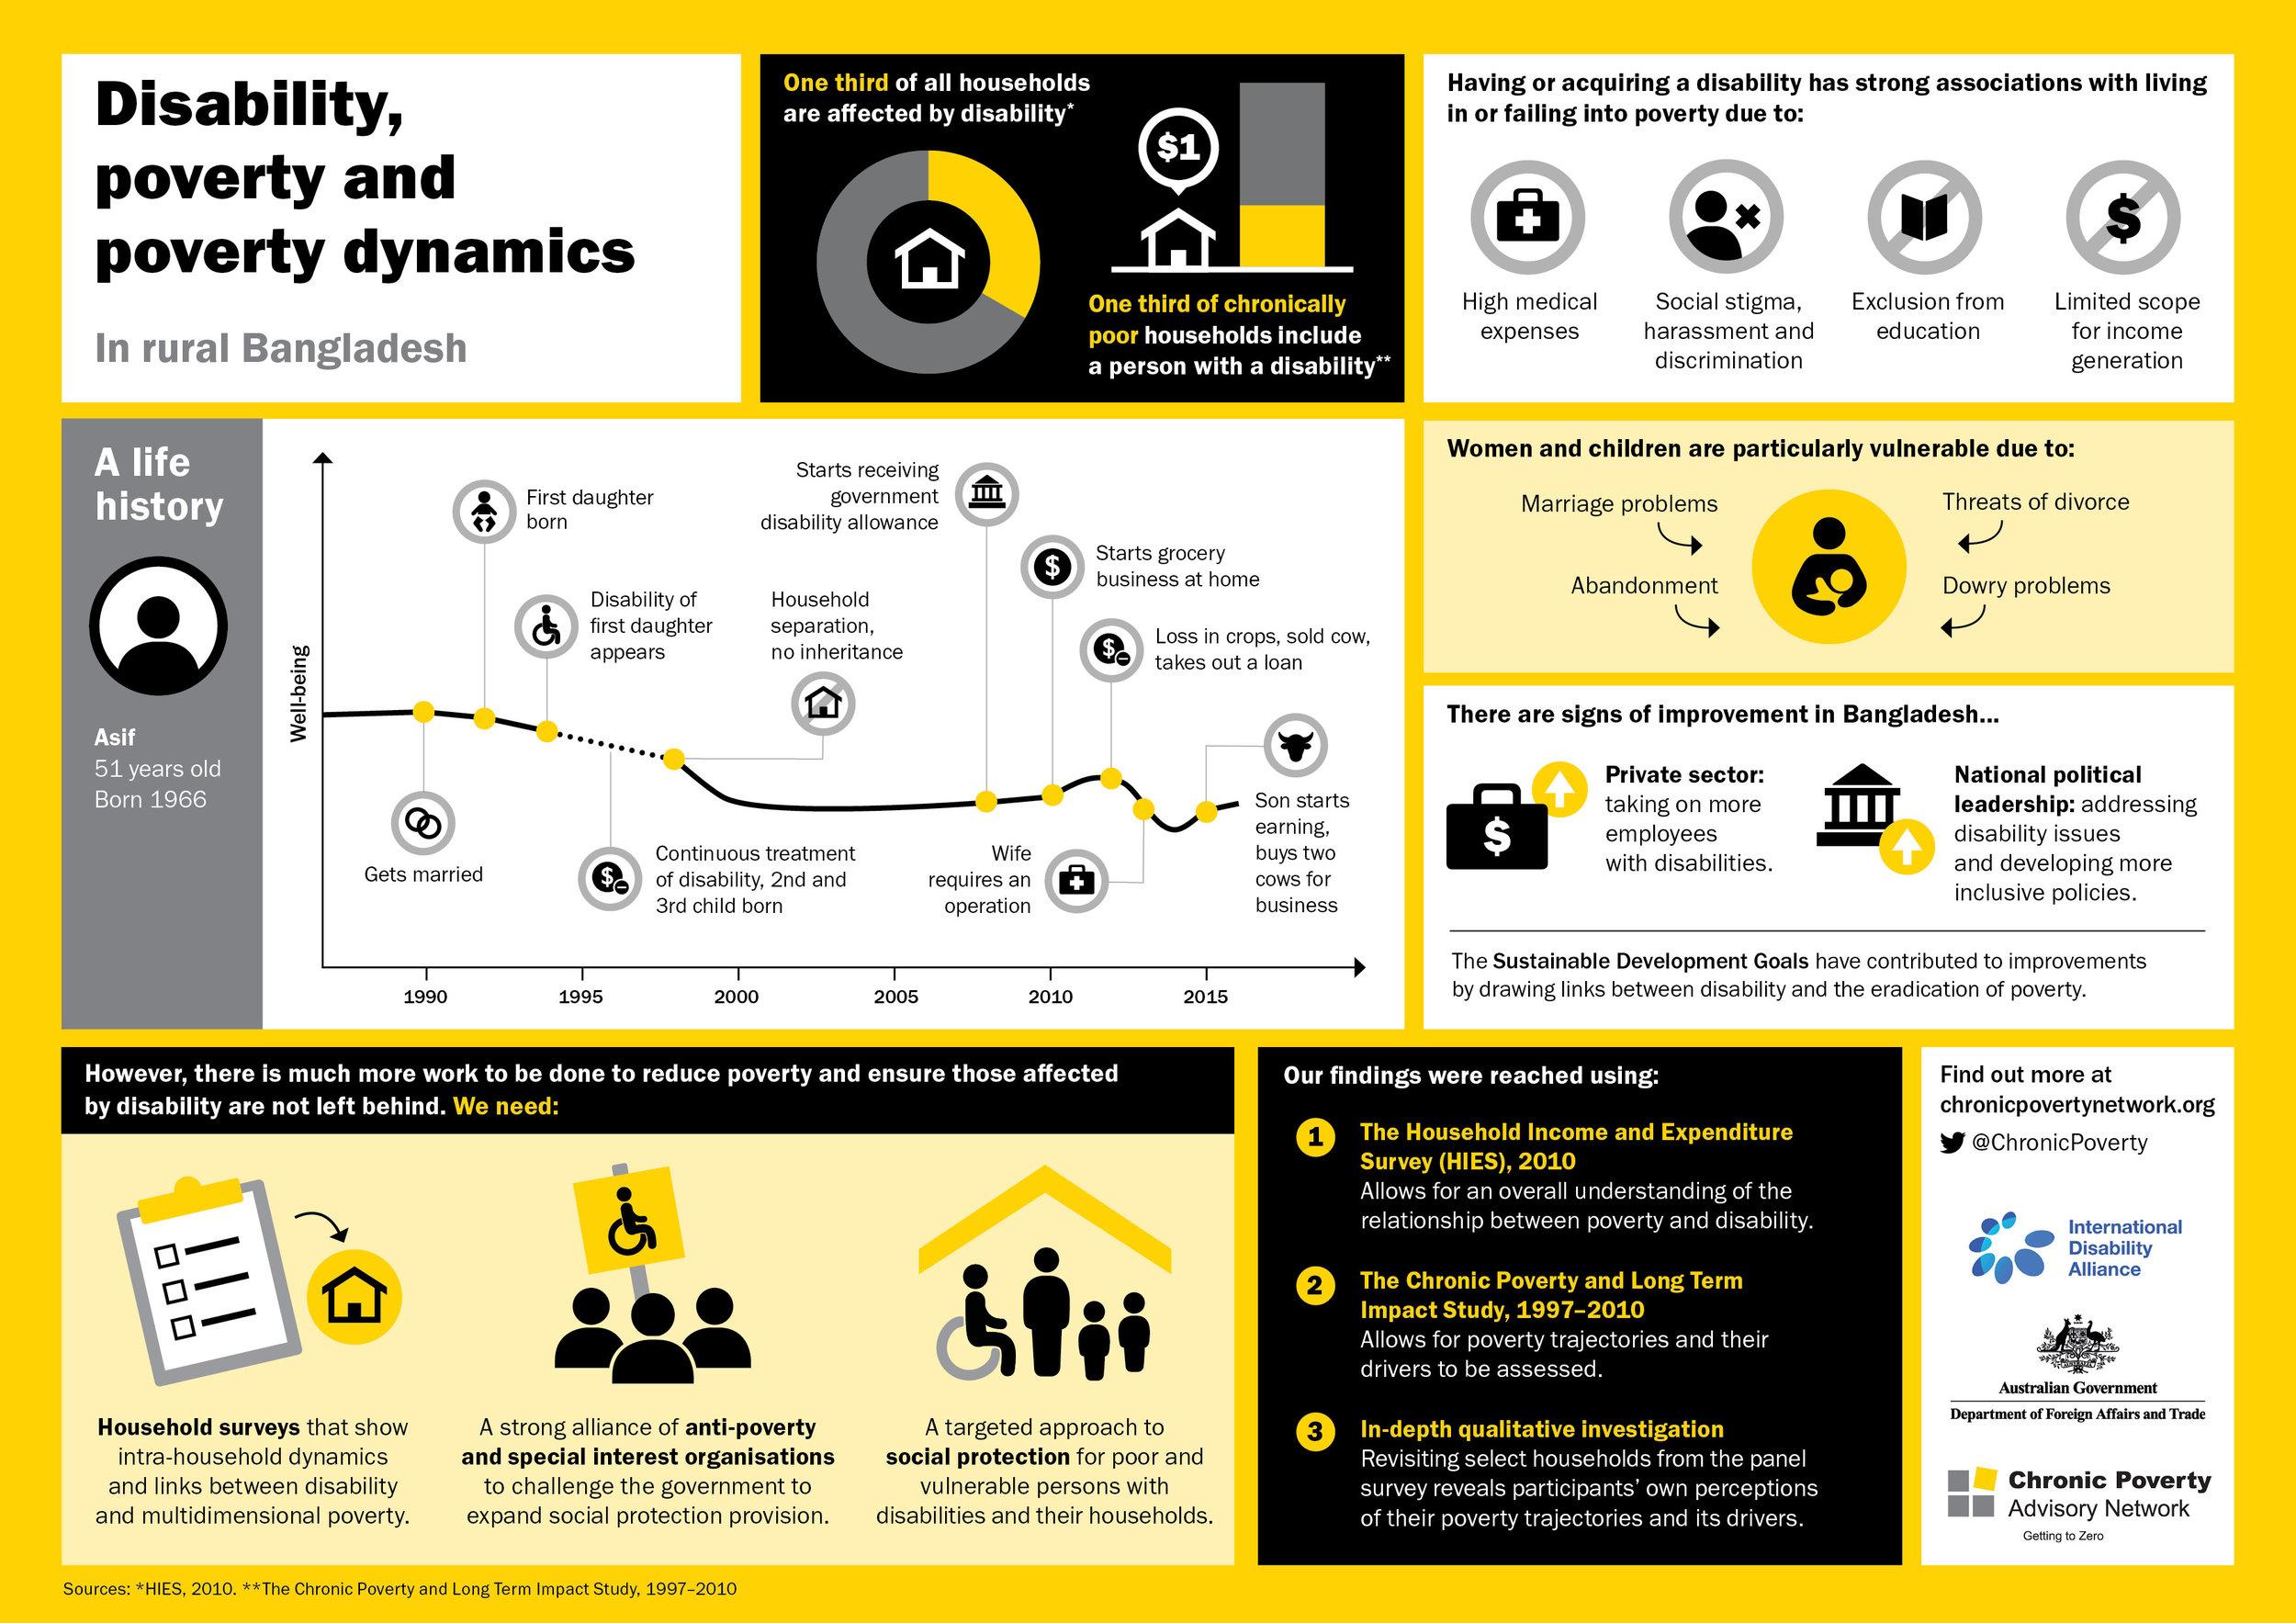 CPAN_Disability_infographic_V4_Web.jpg